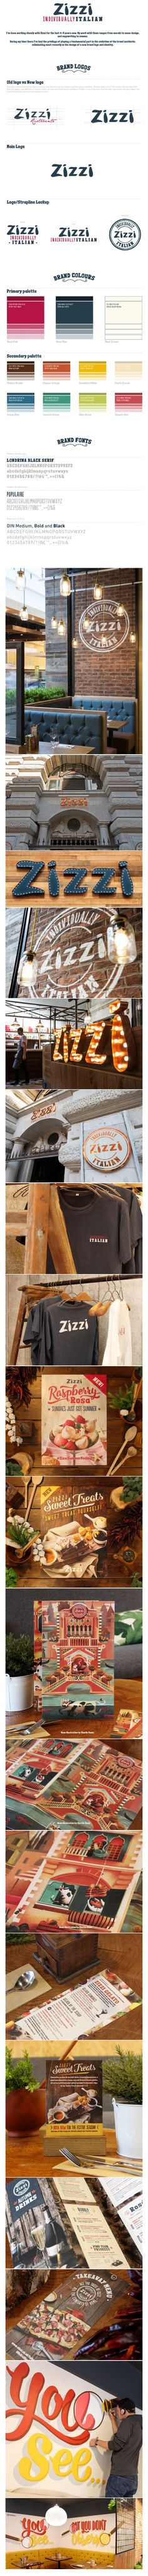 Zizzi     By Tobias Hall, Art Direction Branding Graphic Design